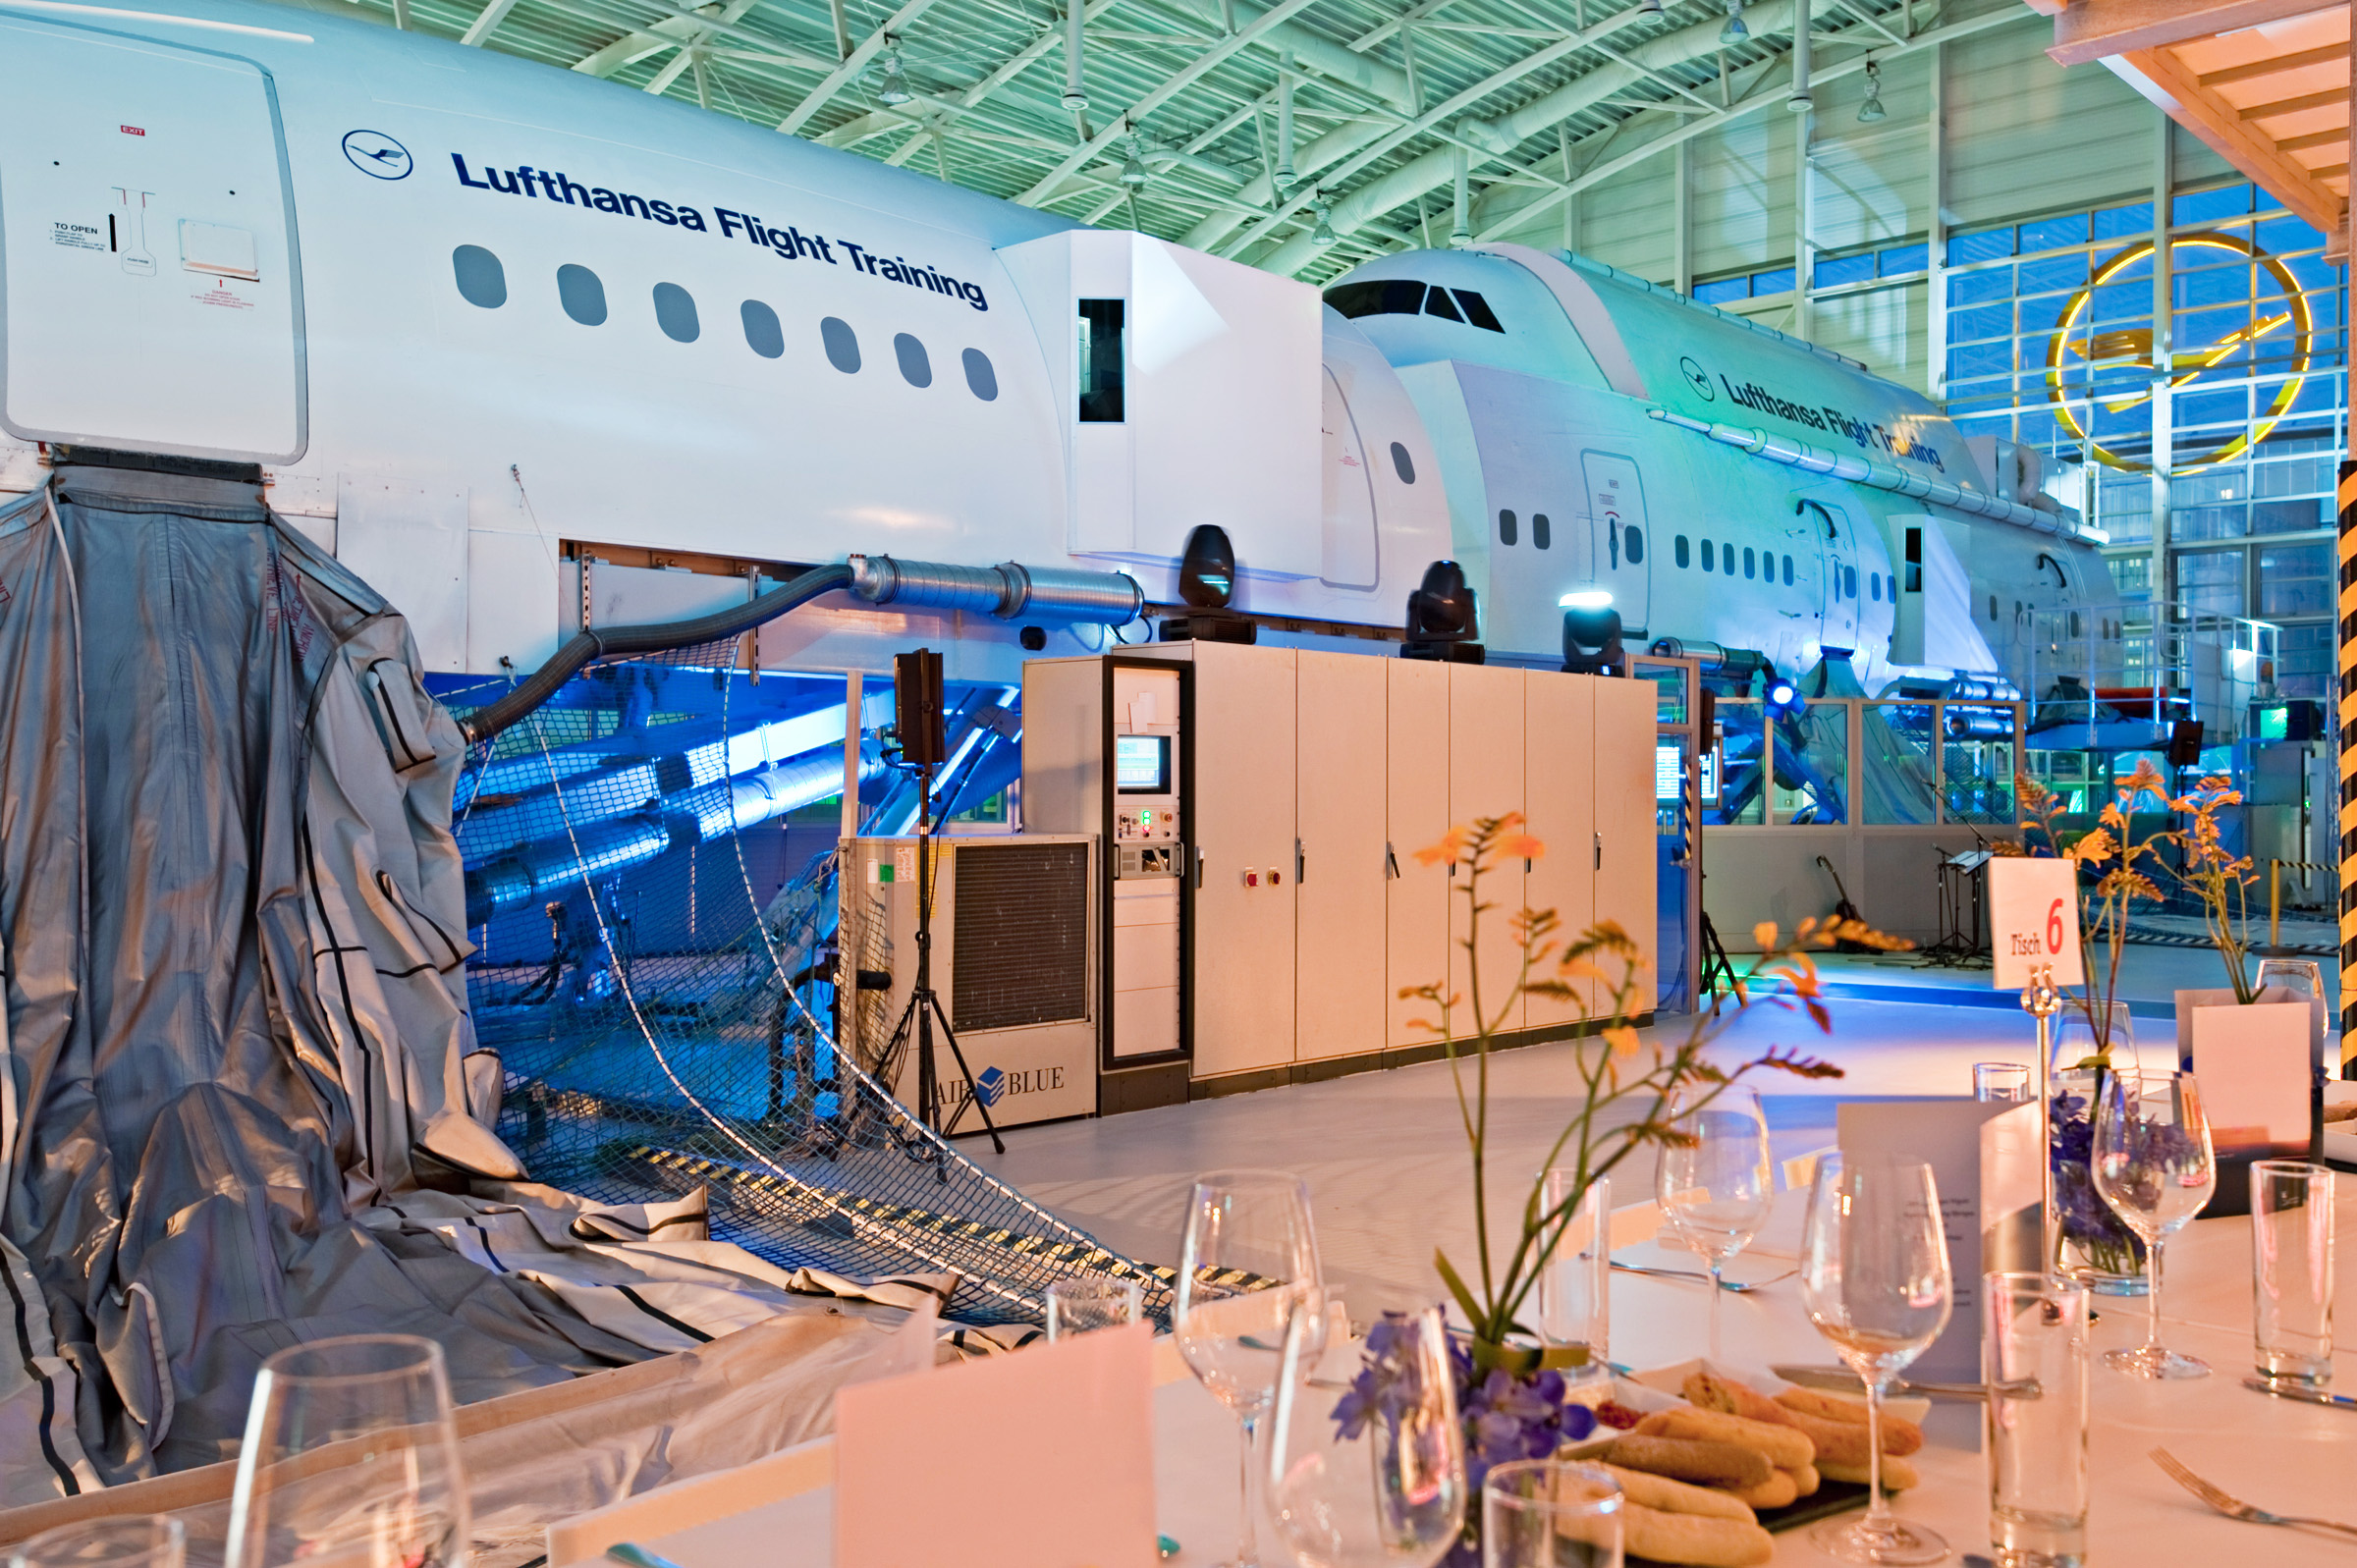 LFTC FRA Simulatorhalle Blick auf Airbus.jpg